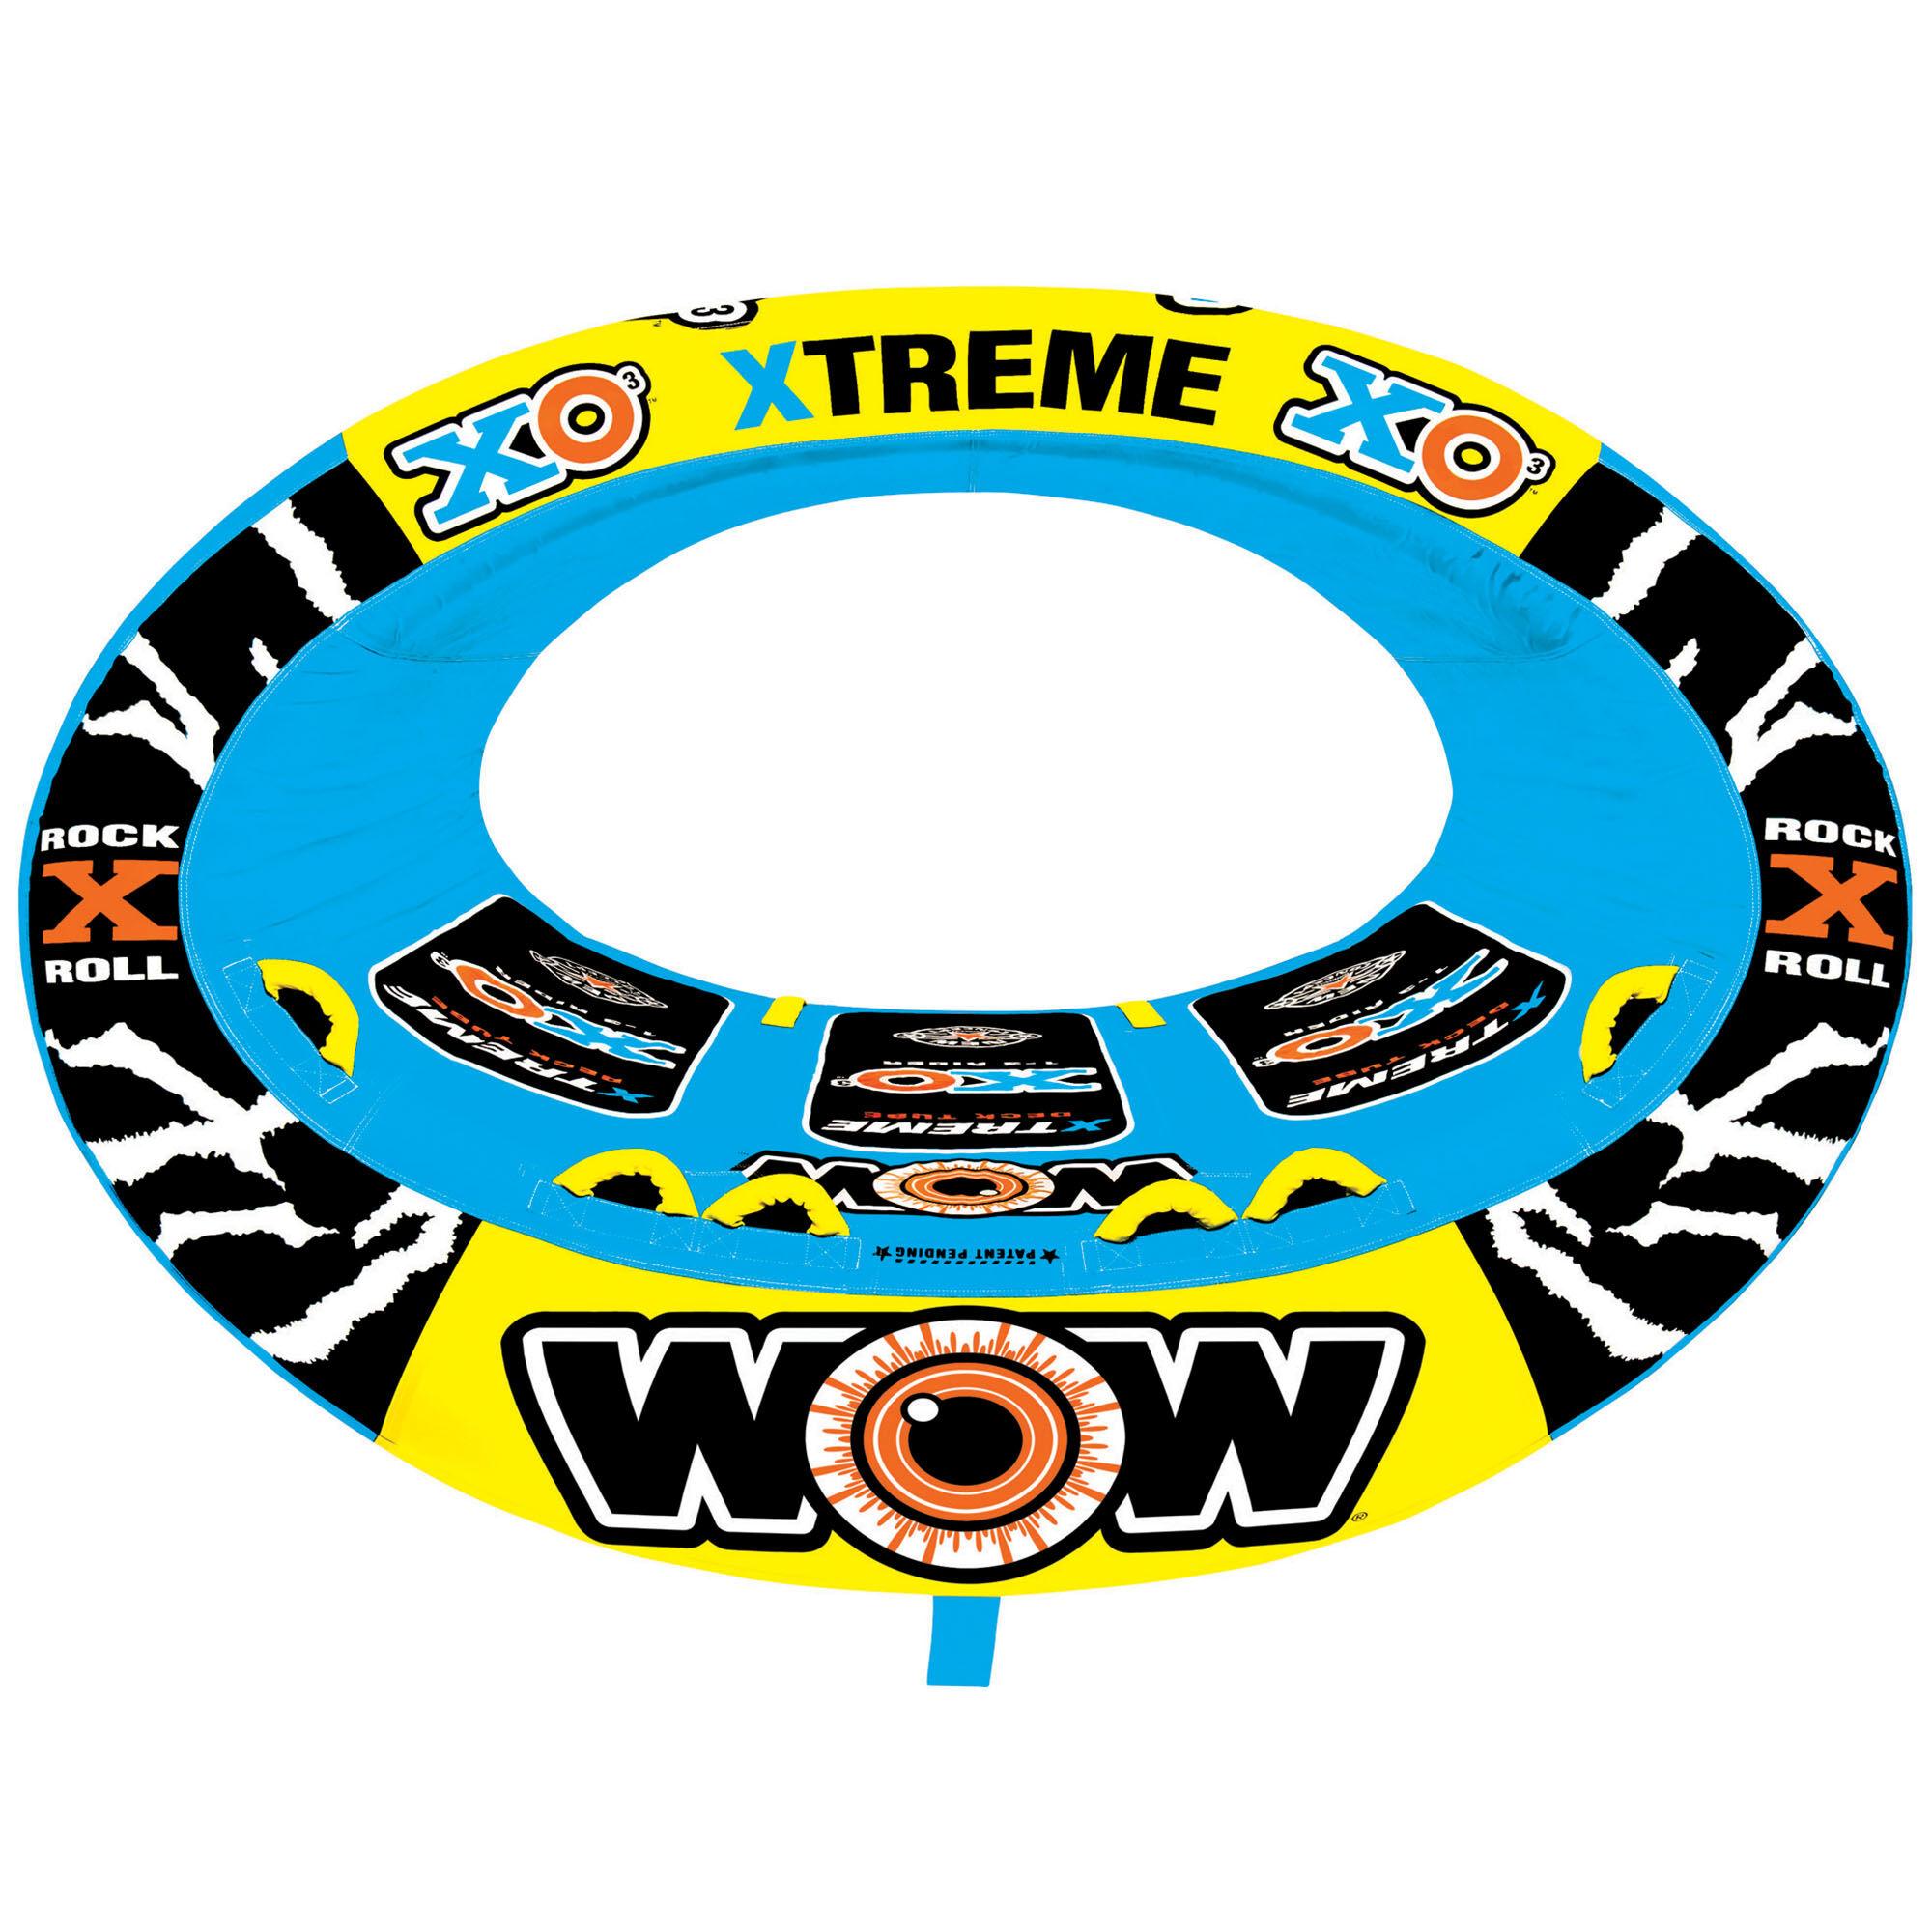 Wow Toys Sports XO Extreme One To Three Person Towable Tube '20  - Black/Blue/Yellow - Size: One Size